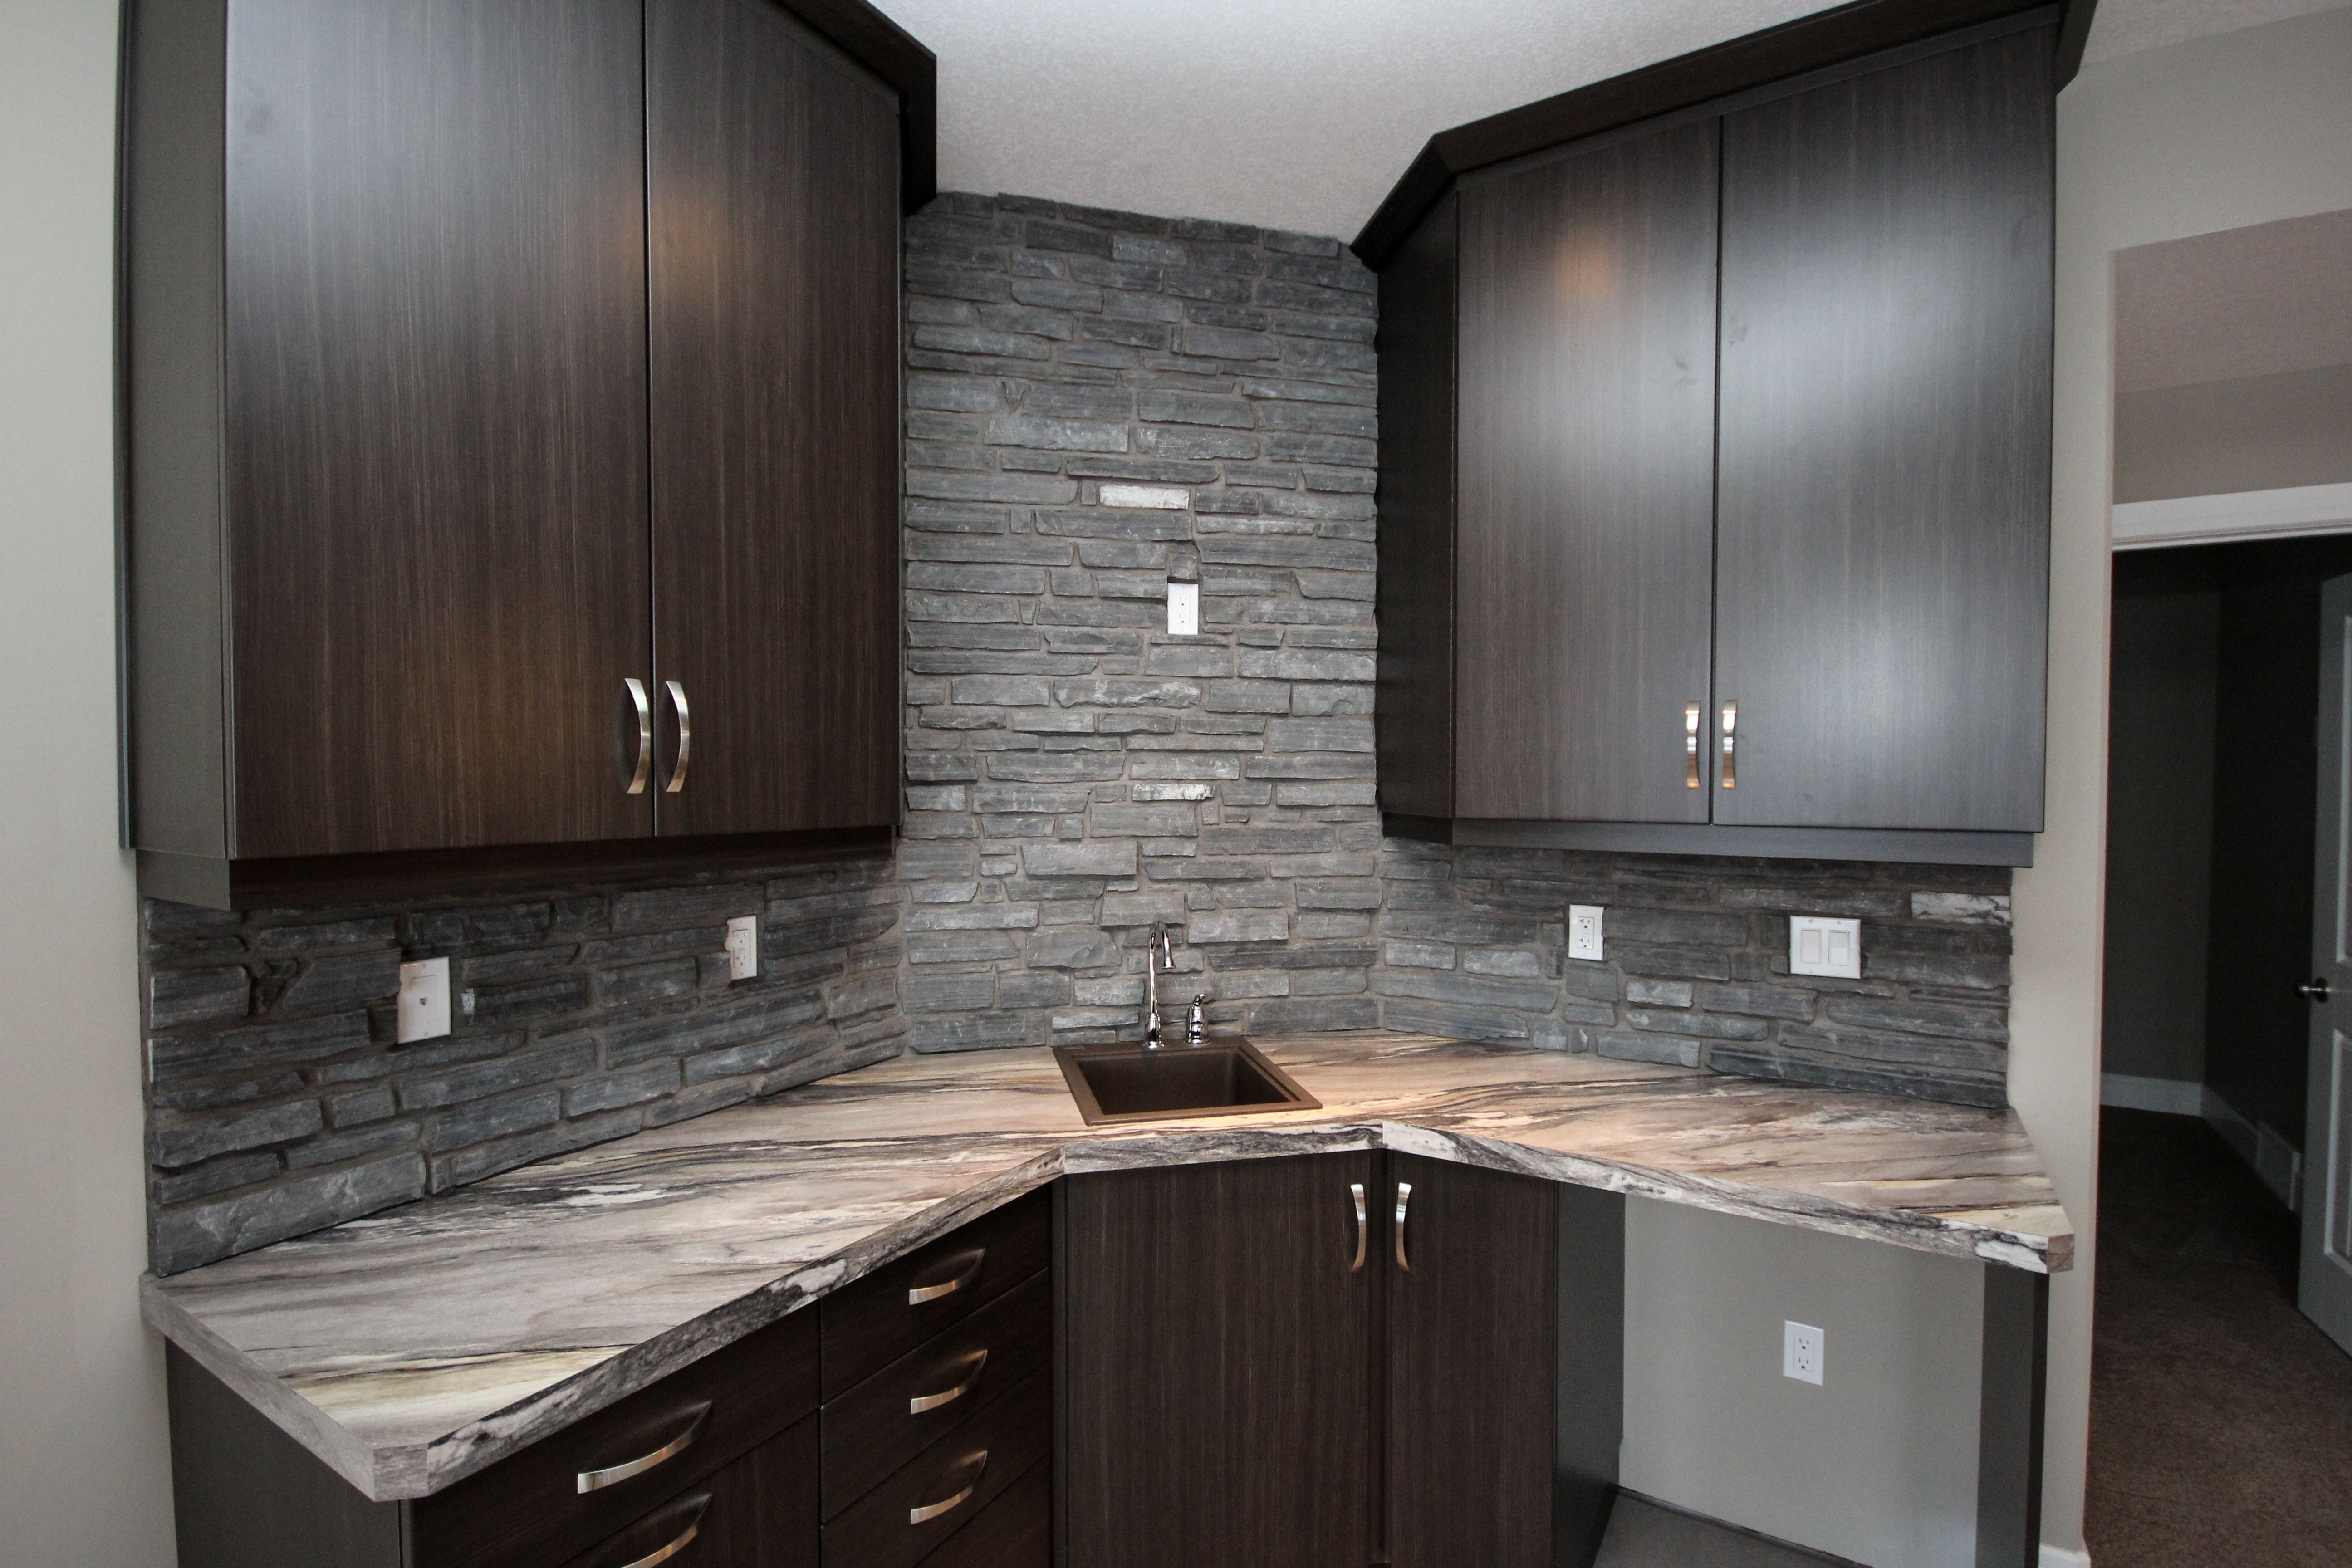 Deluxe Wet Bar In Basement Stone And Chocolate Cabinets Like The L Shape Basement Bar Basement Bar Designs Wet Bar Basement